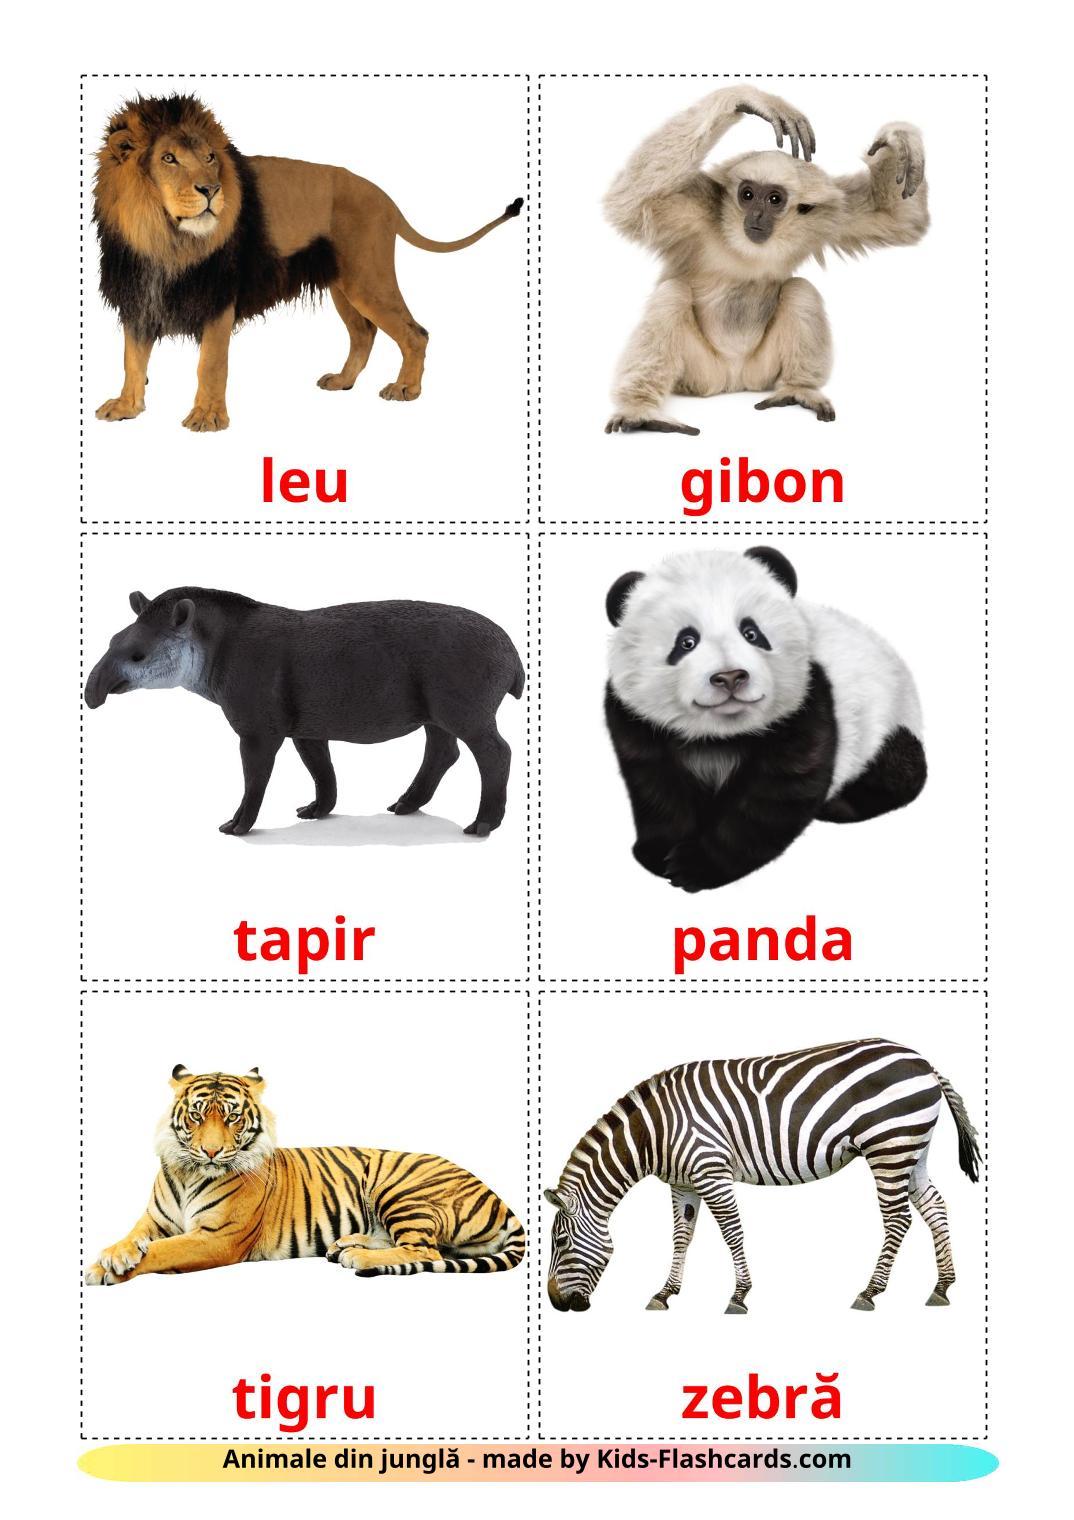 Jungle animals - 21 Free Printable romanian Flashcards